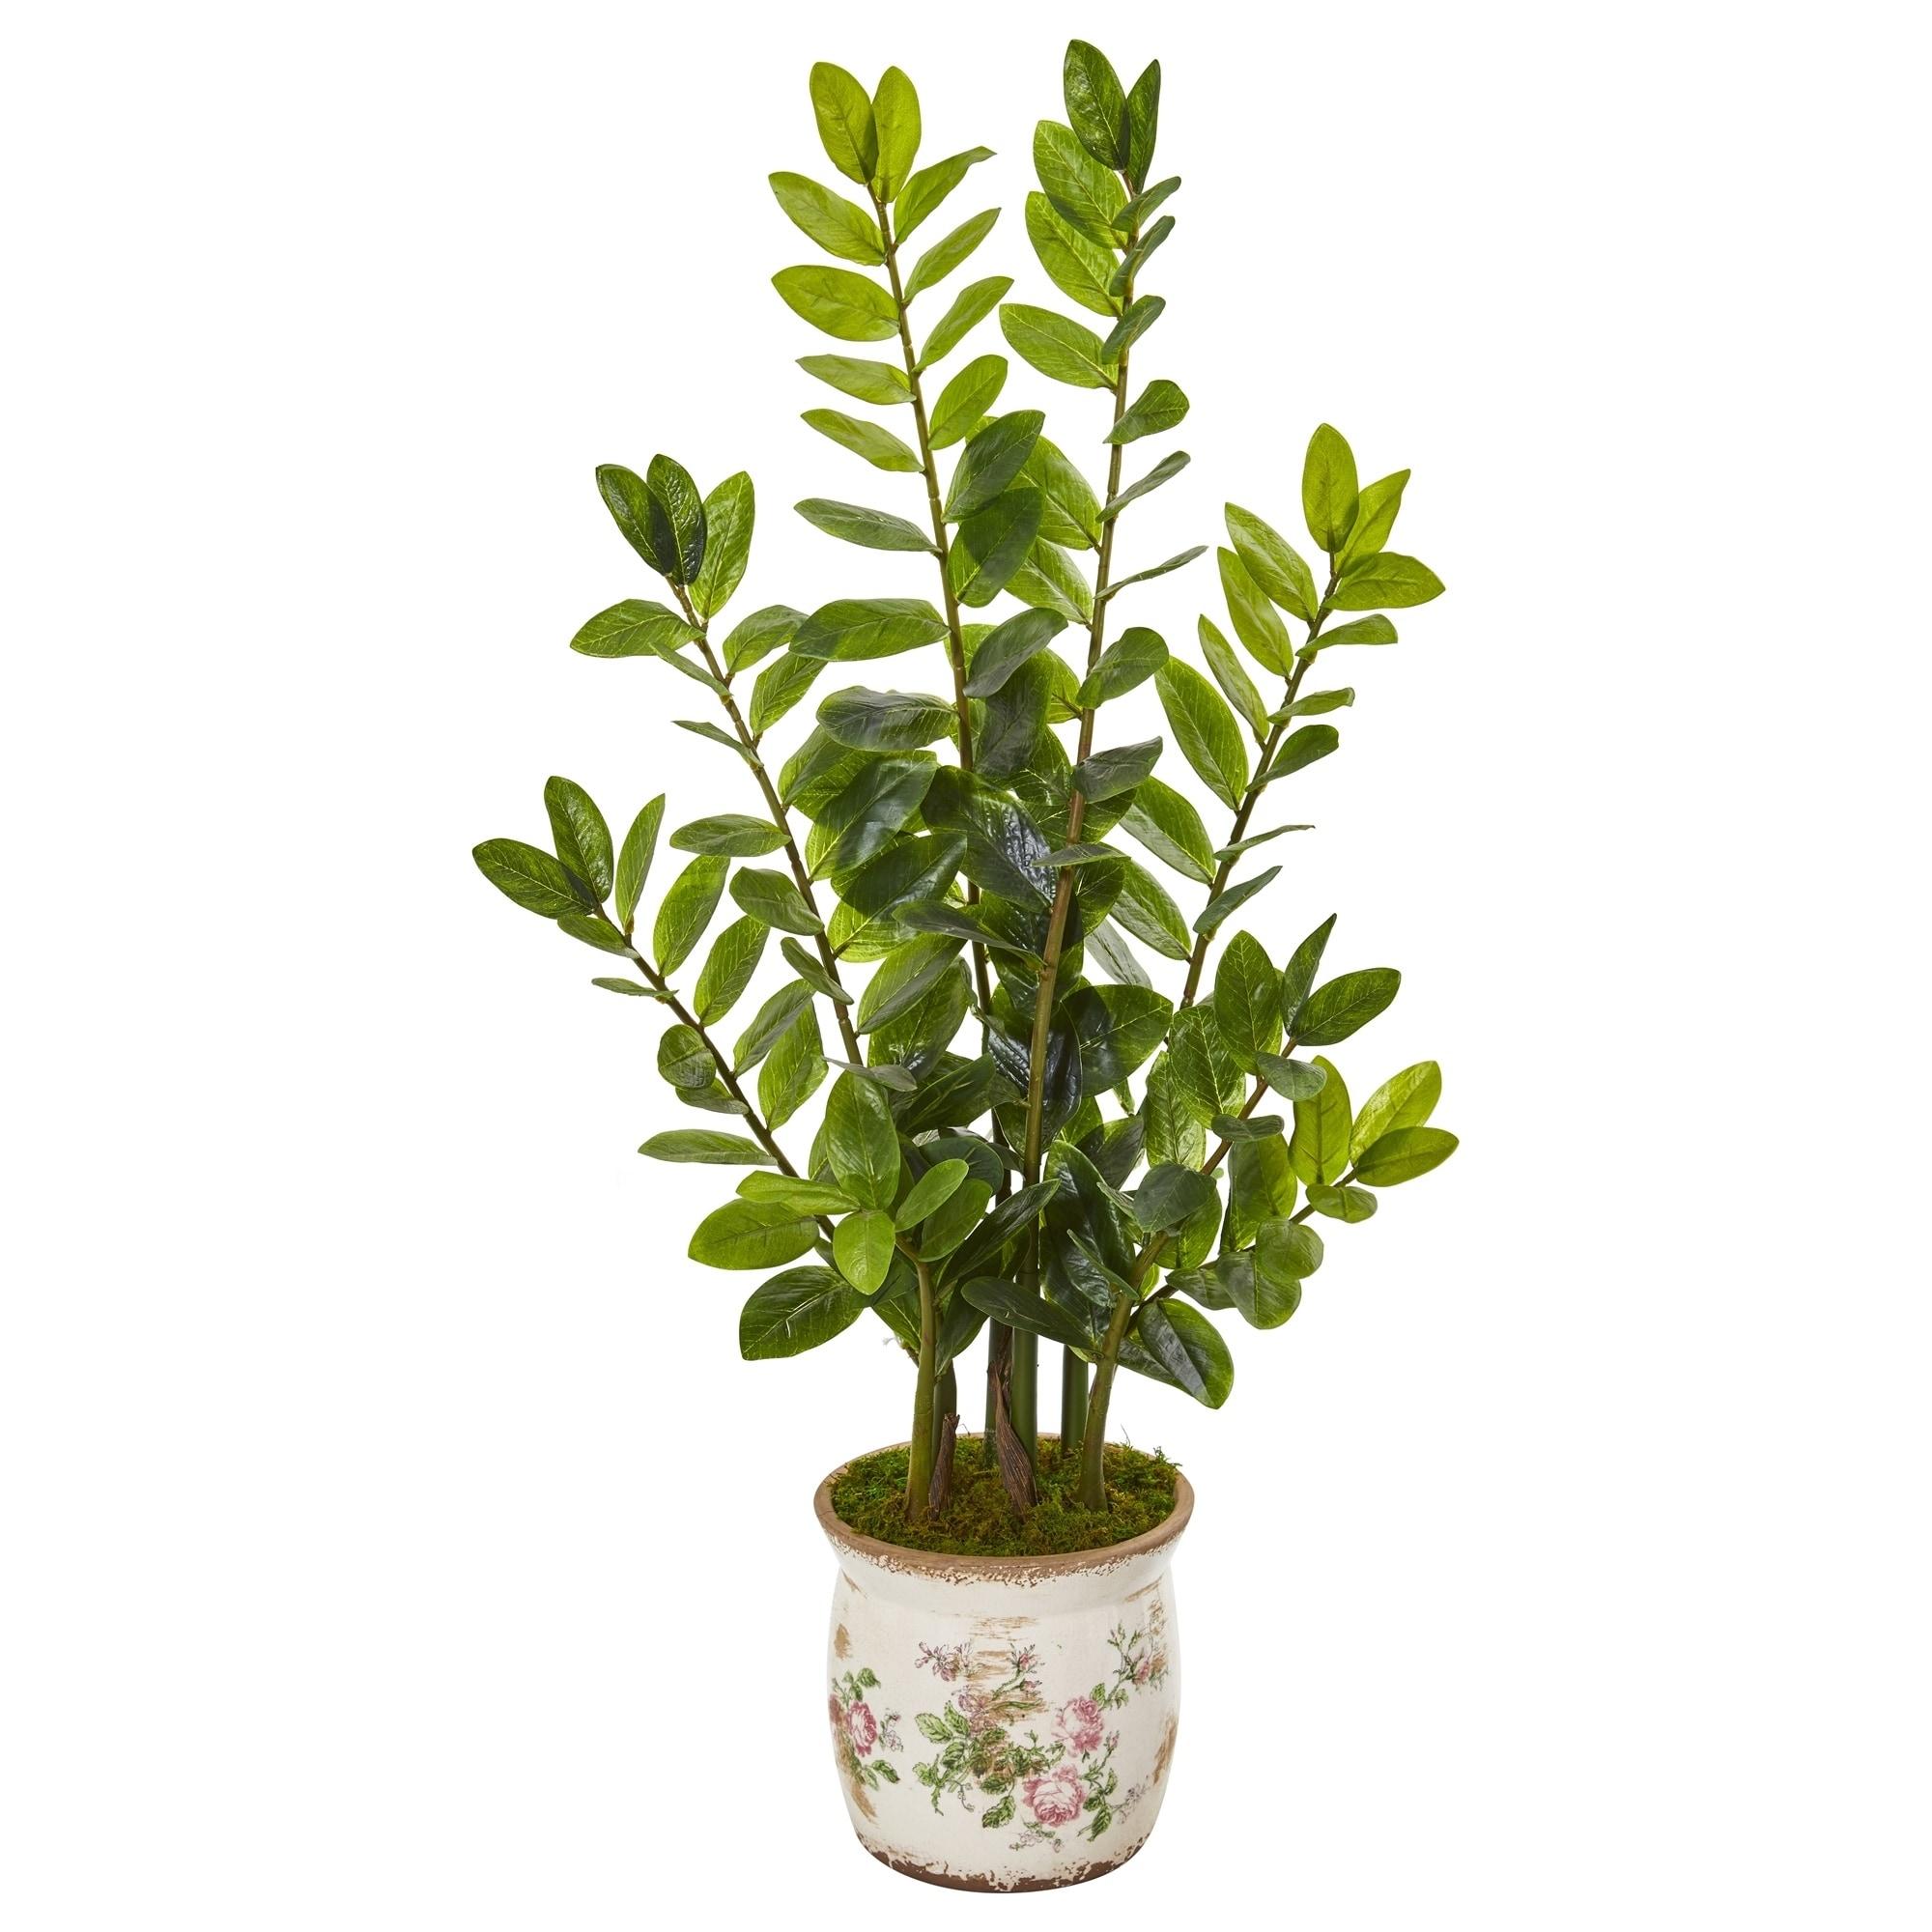 39 Zamioculcas Artificial Plant in Floral Design Planter